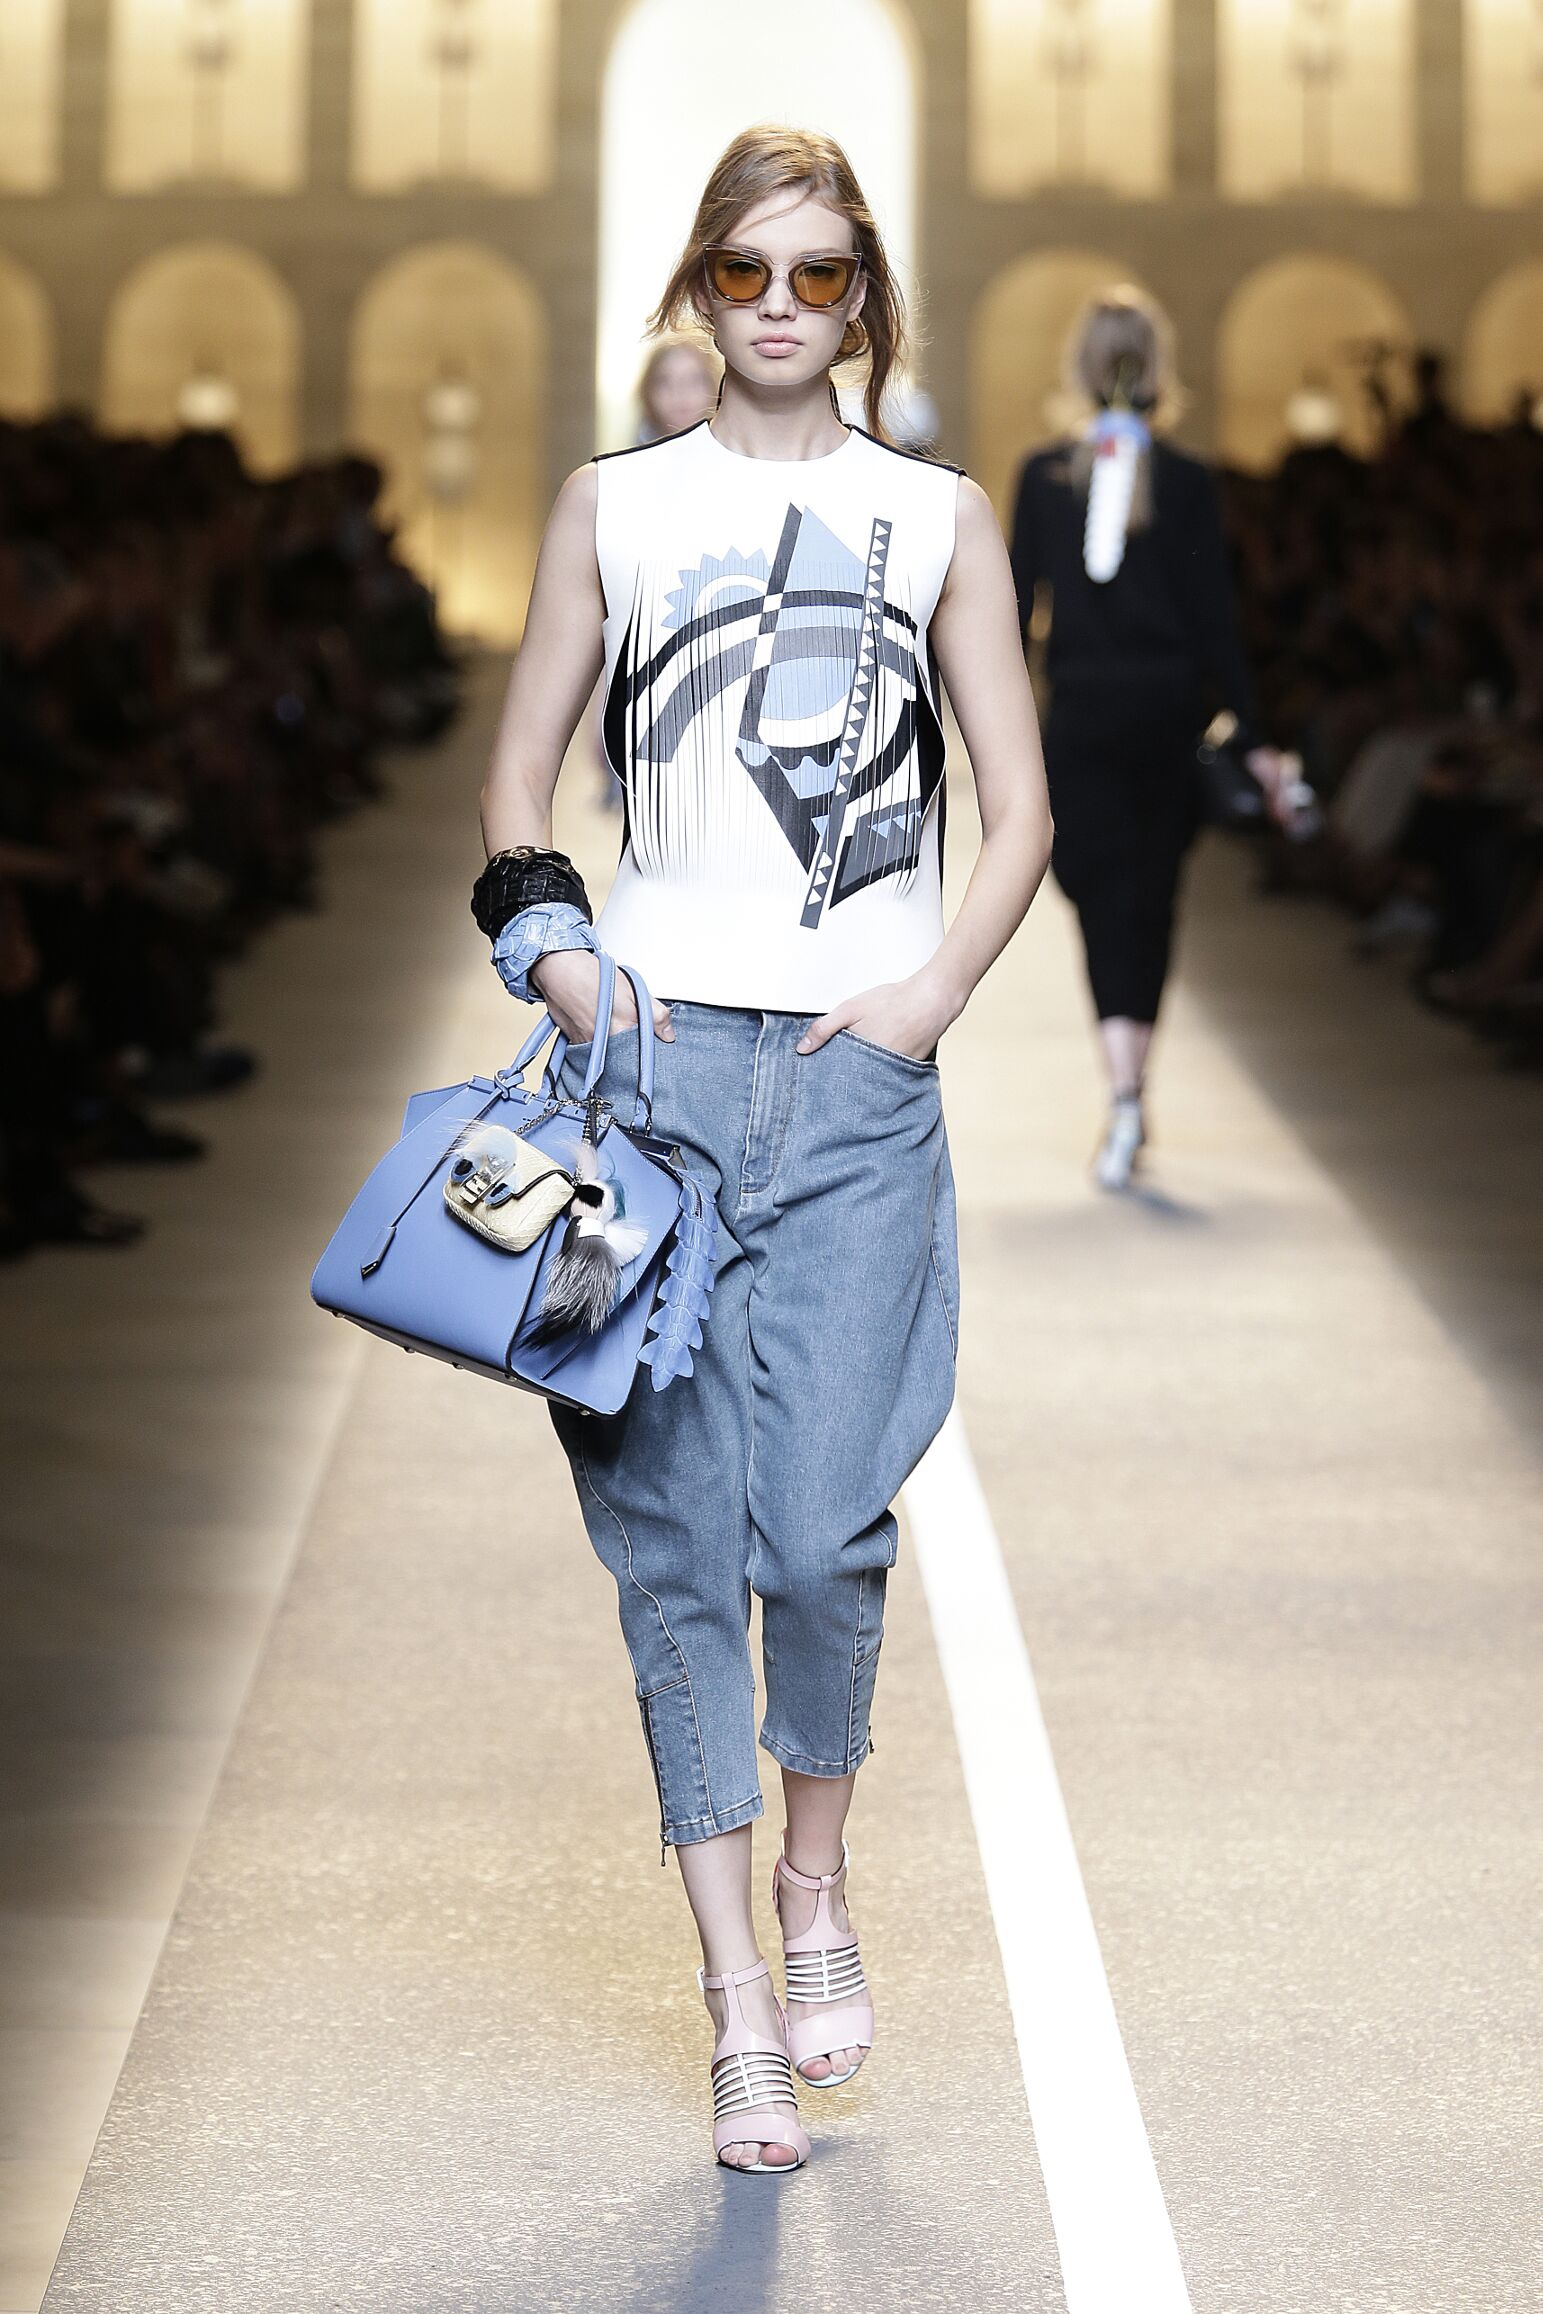 Fendi Summer 2015 Womenswear